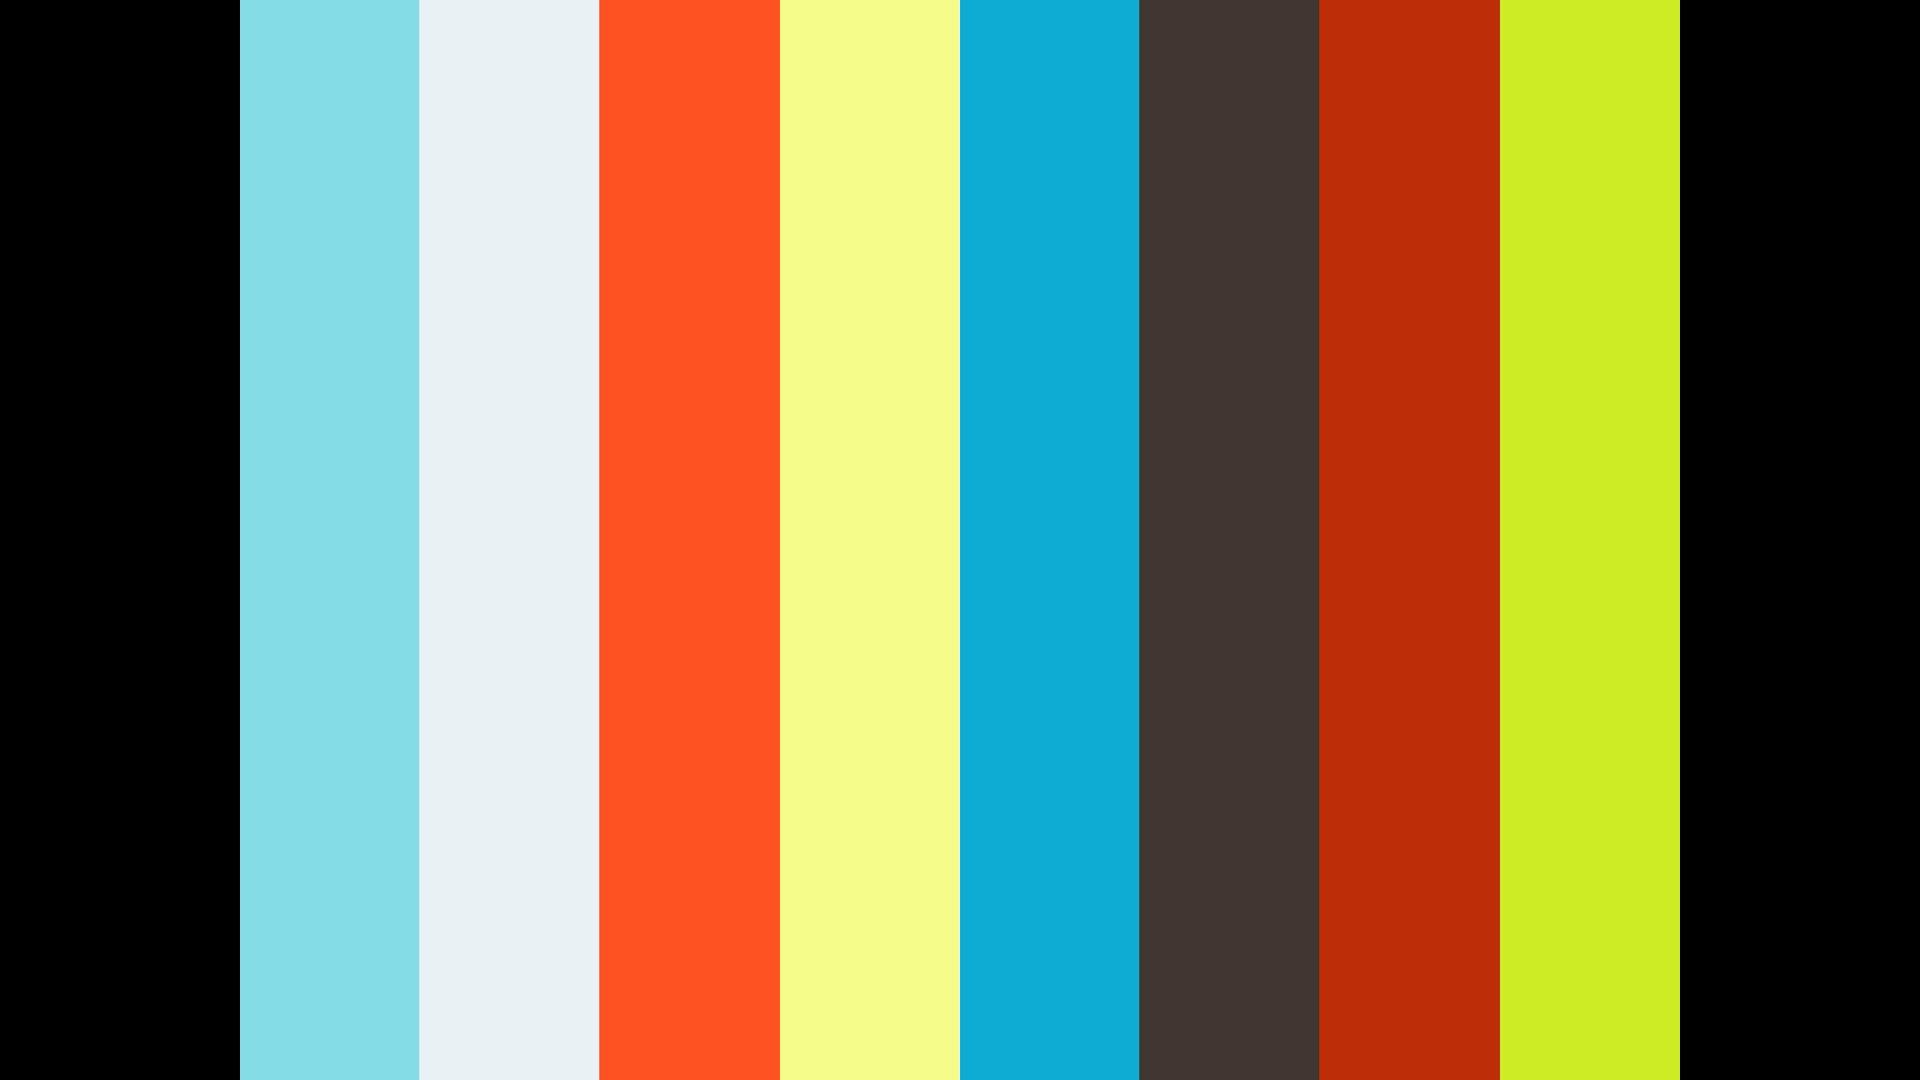 PRIME - The Future of semi-custom